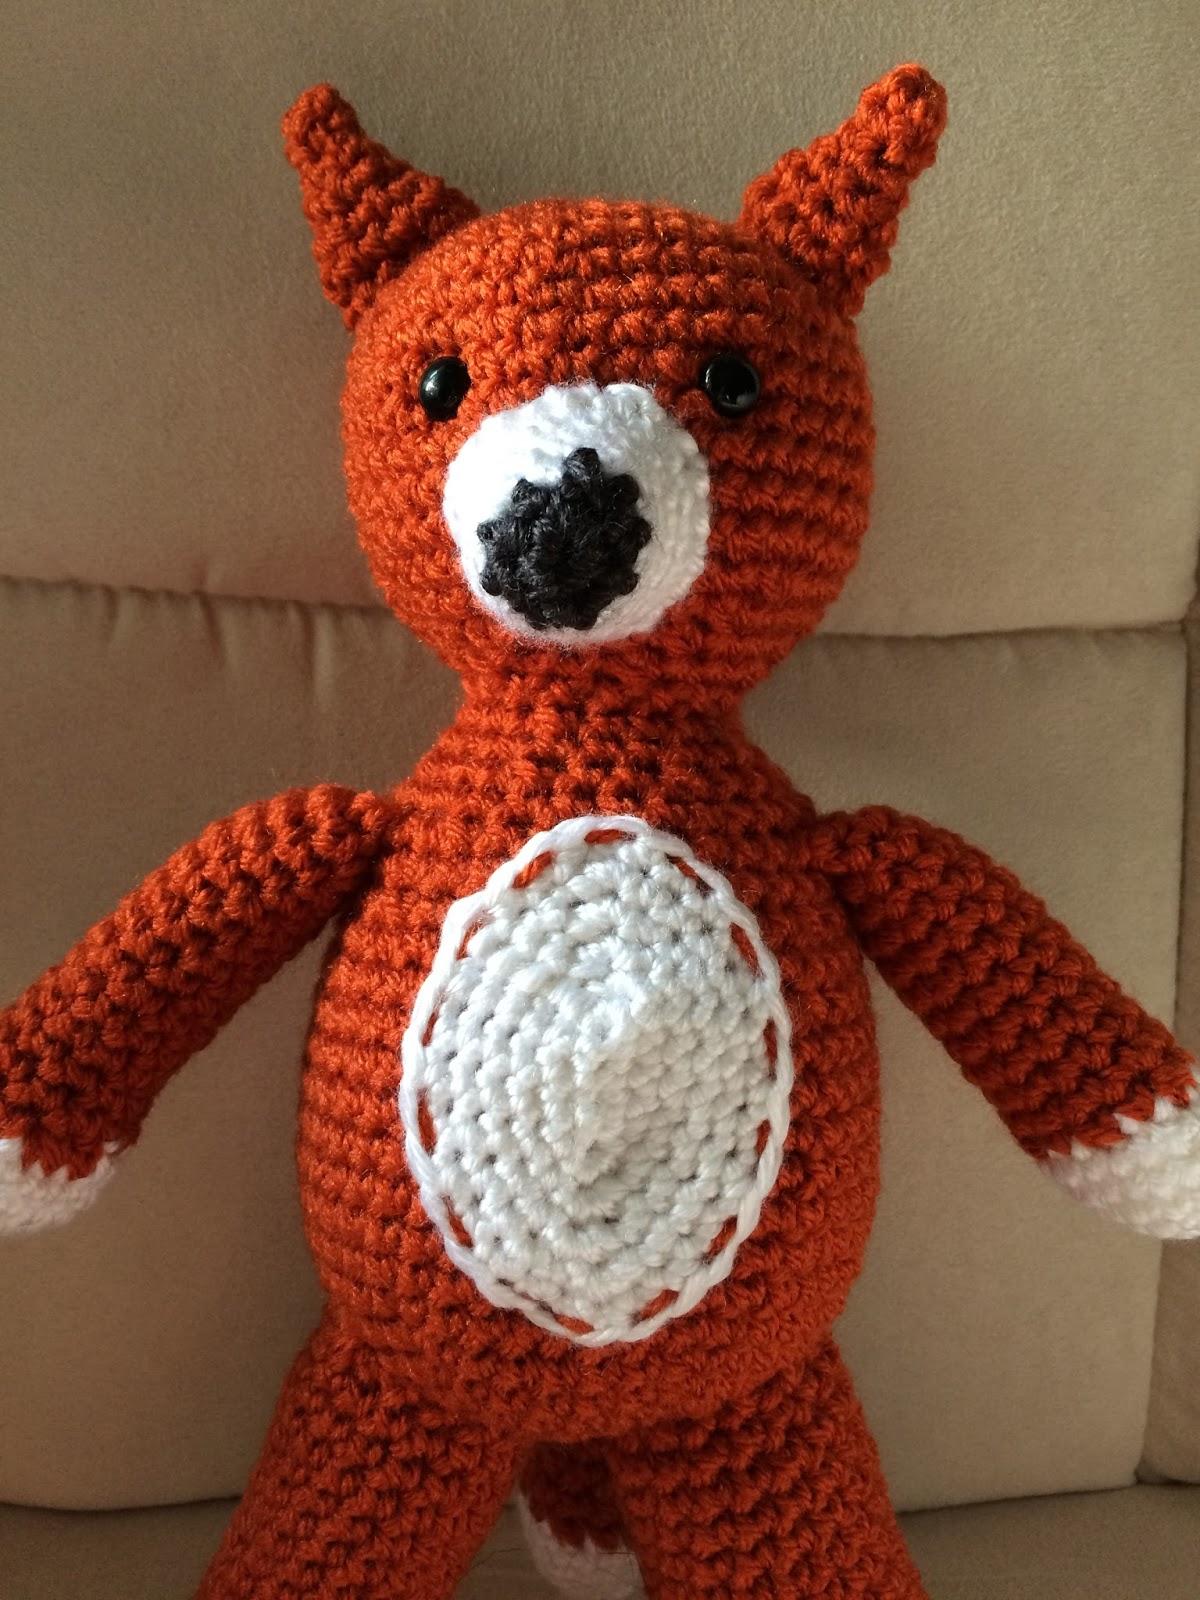 Olena's Crafts: Fox Amigurumi Design - Free crochet pattern